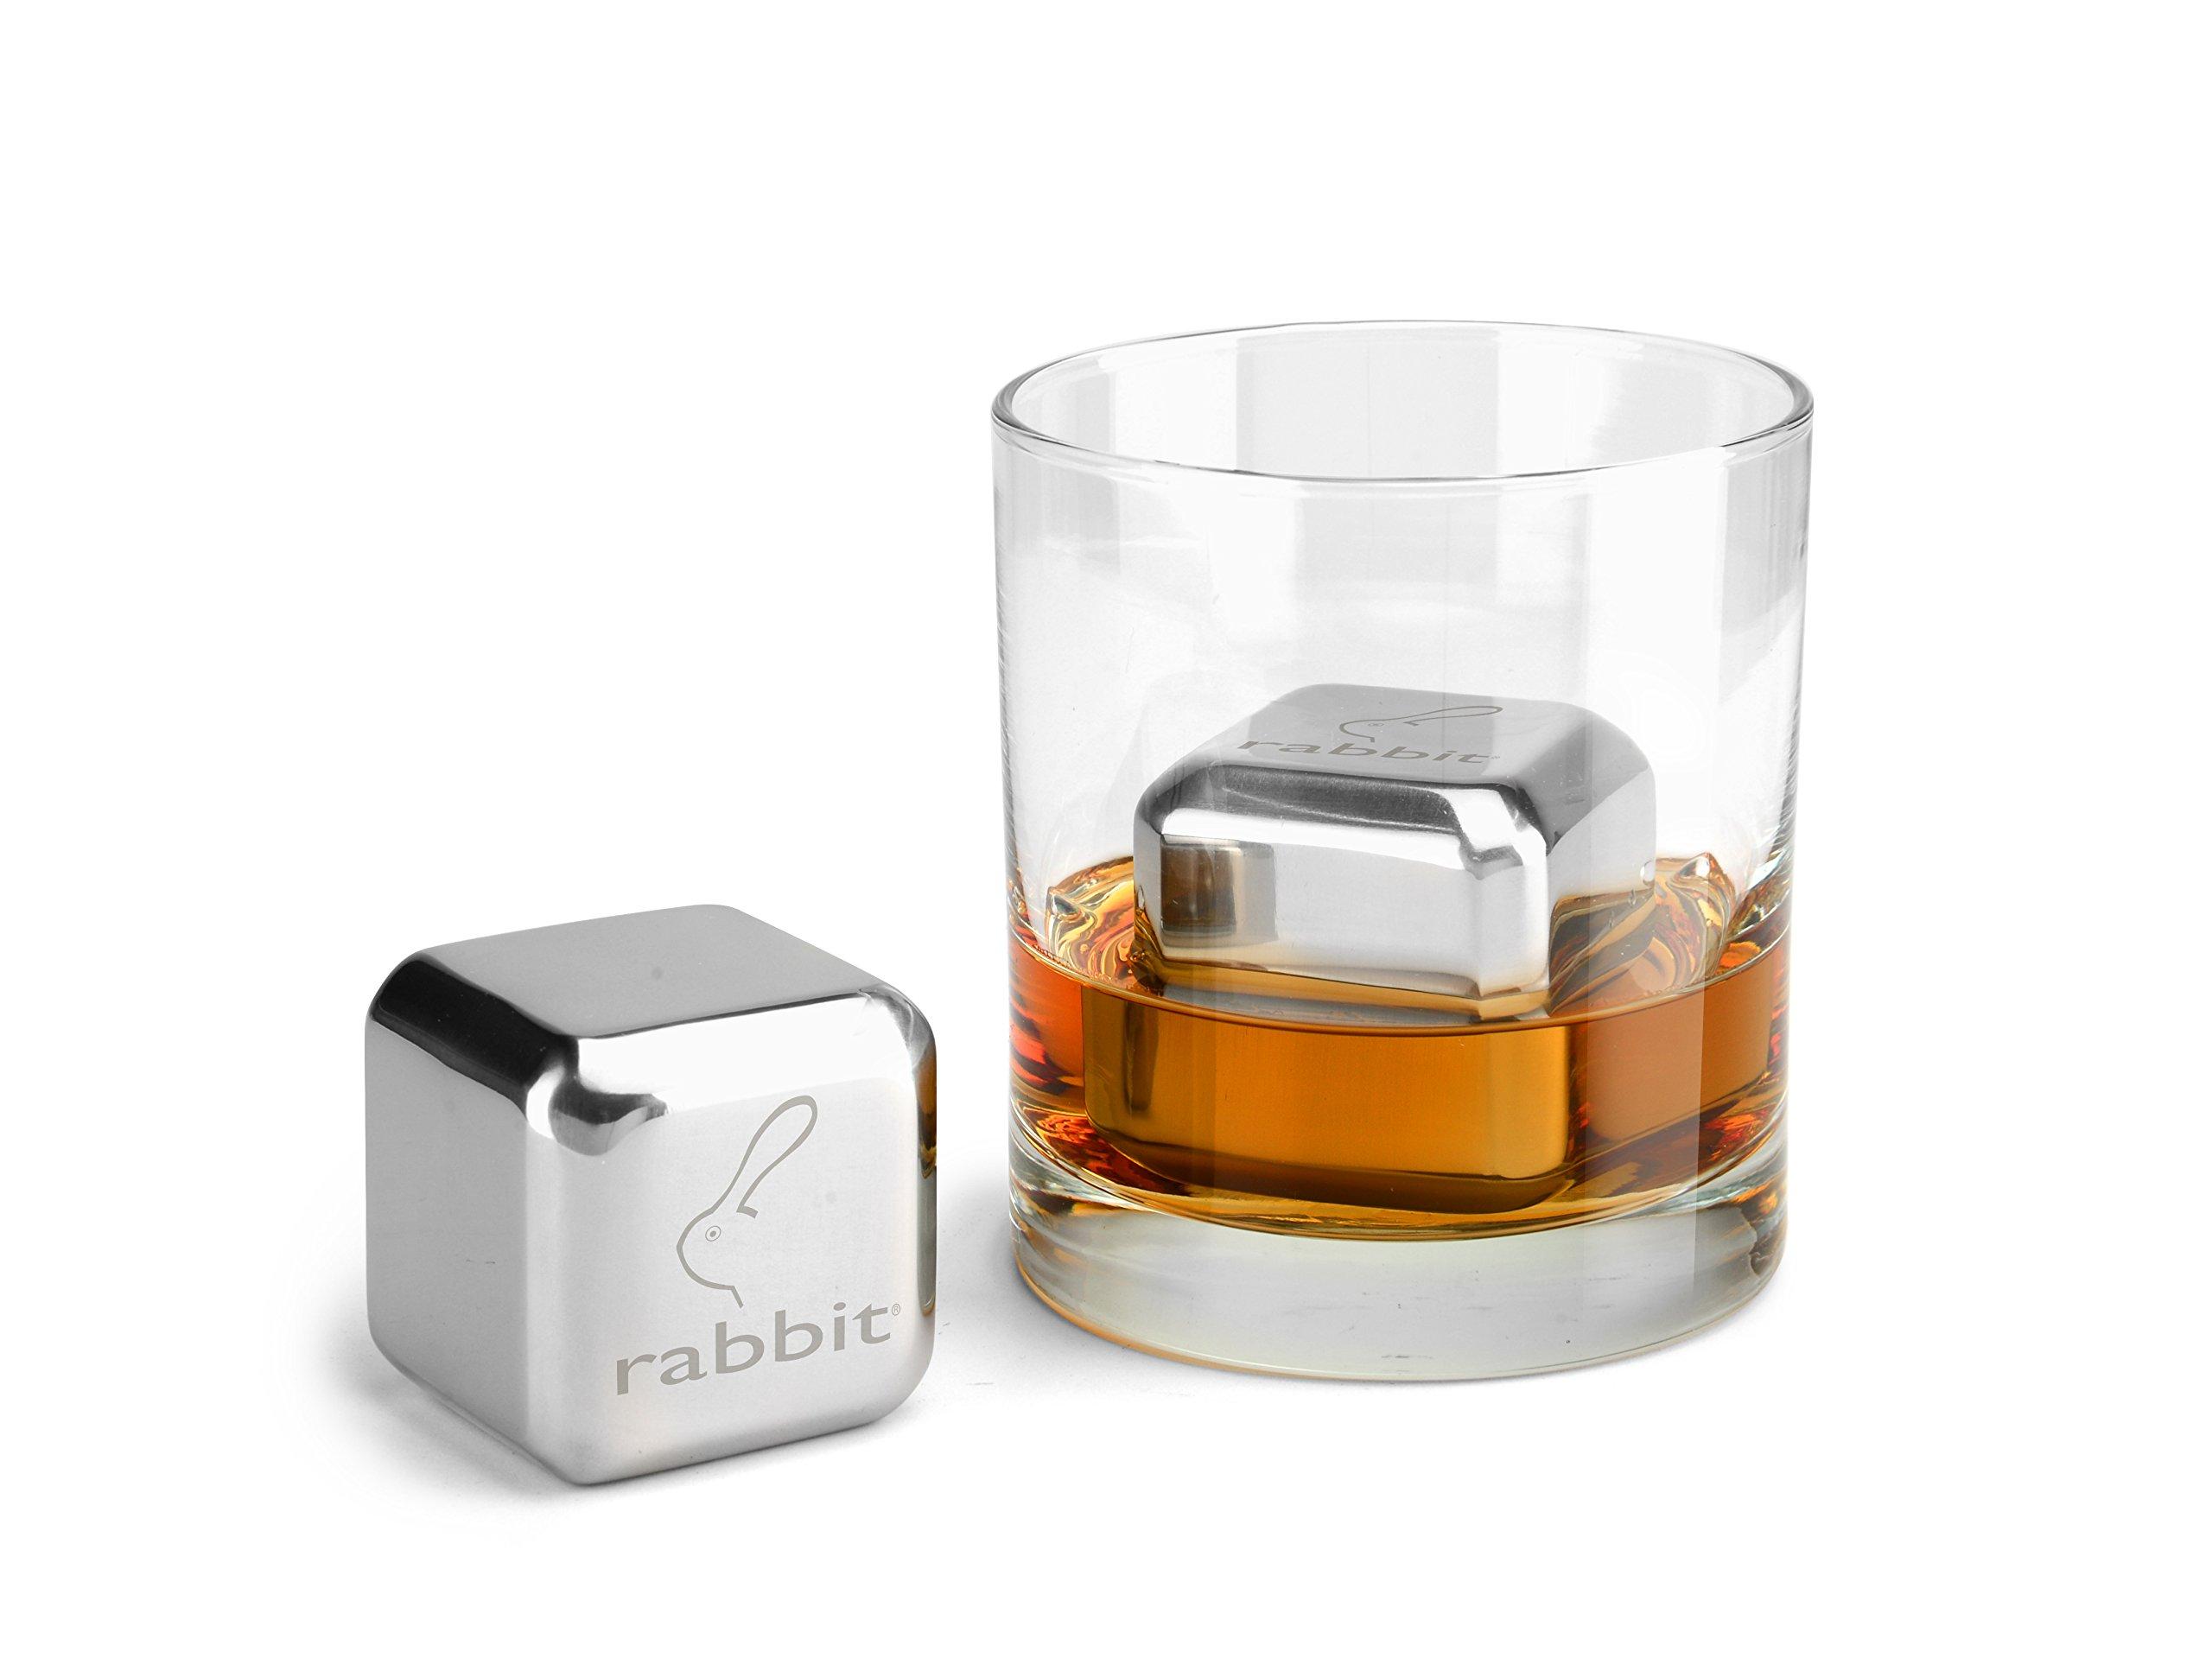 Rabbit Whiskey and Beverage Jumbo Chilling Stones Set (Chrome) by Rabbit (Image #2)